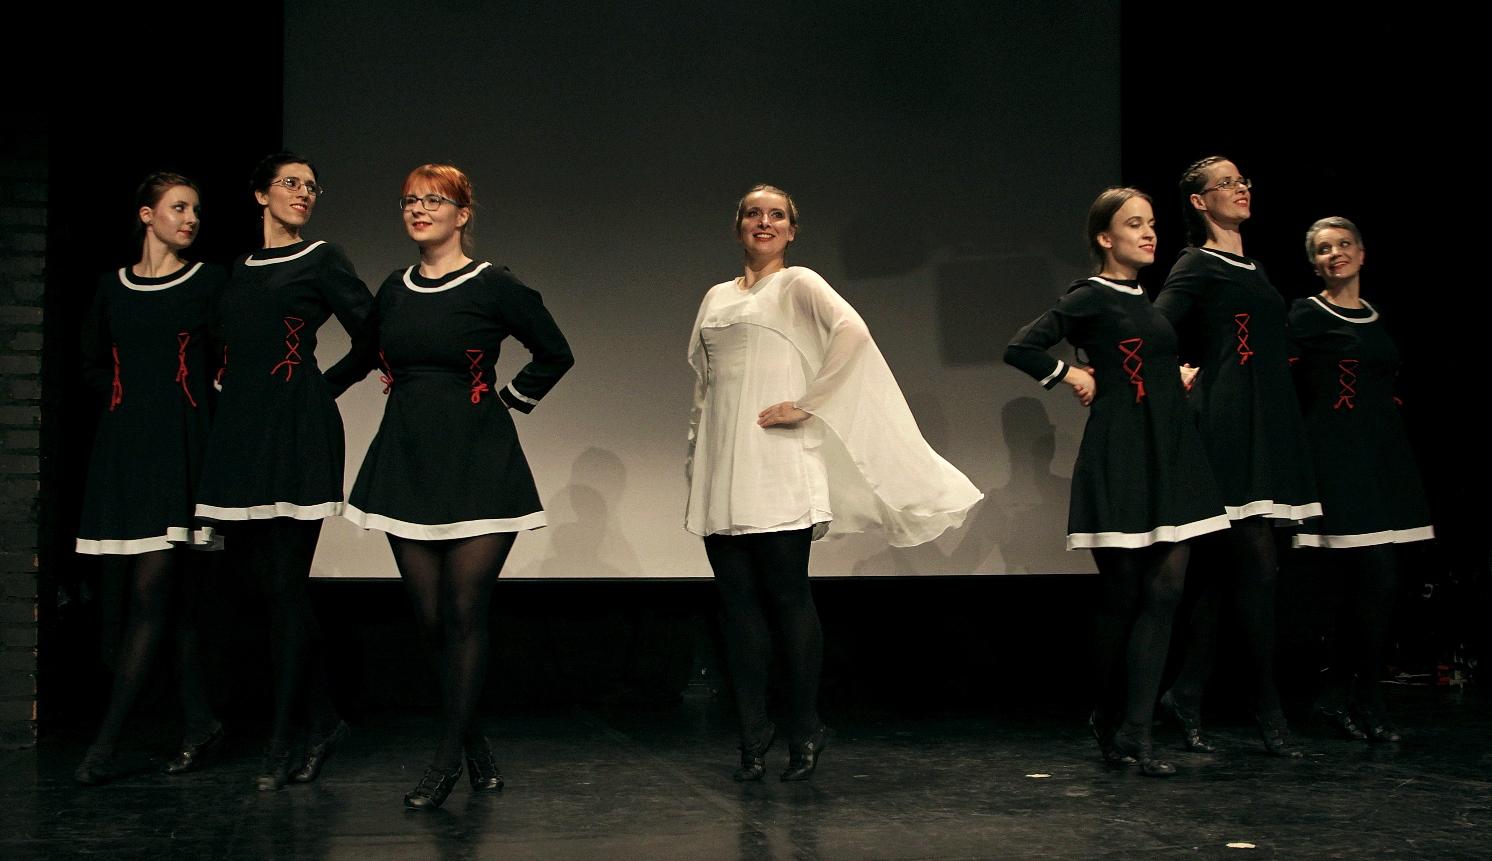 fot. Piotr Pałasz